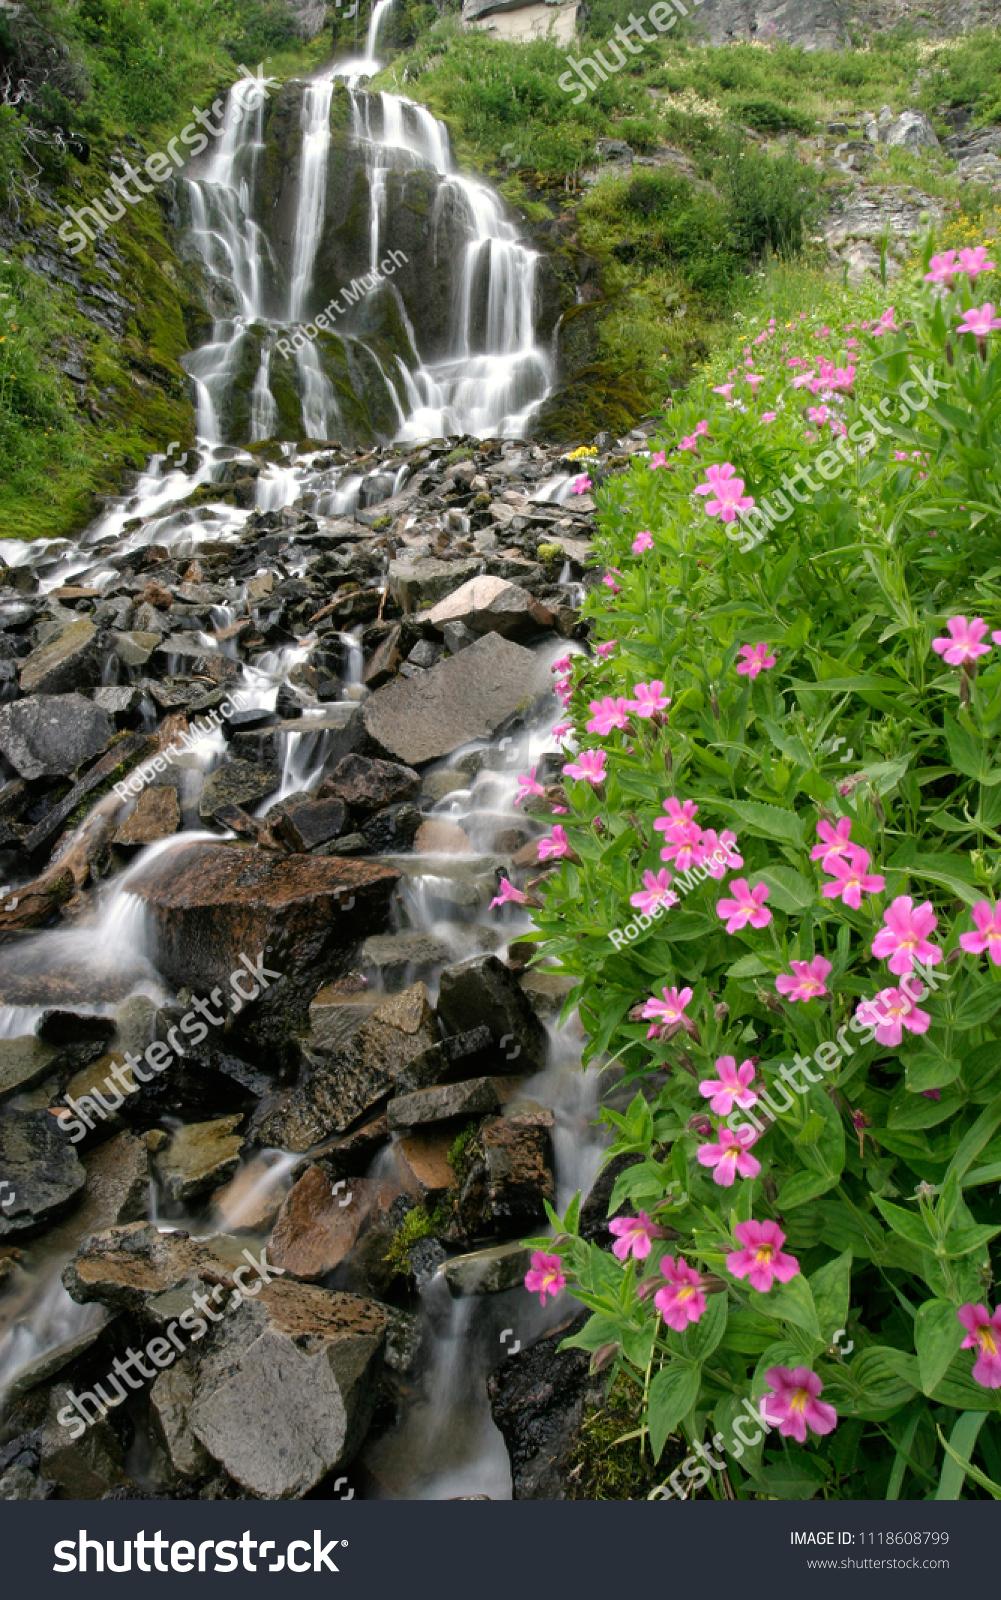 Vidae Falls Wildflowers Pink Monkeyflower Crater Stock Photo